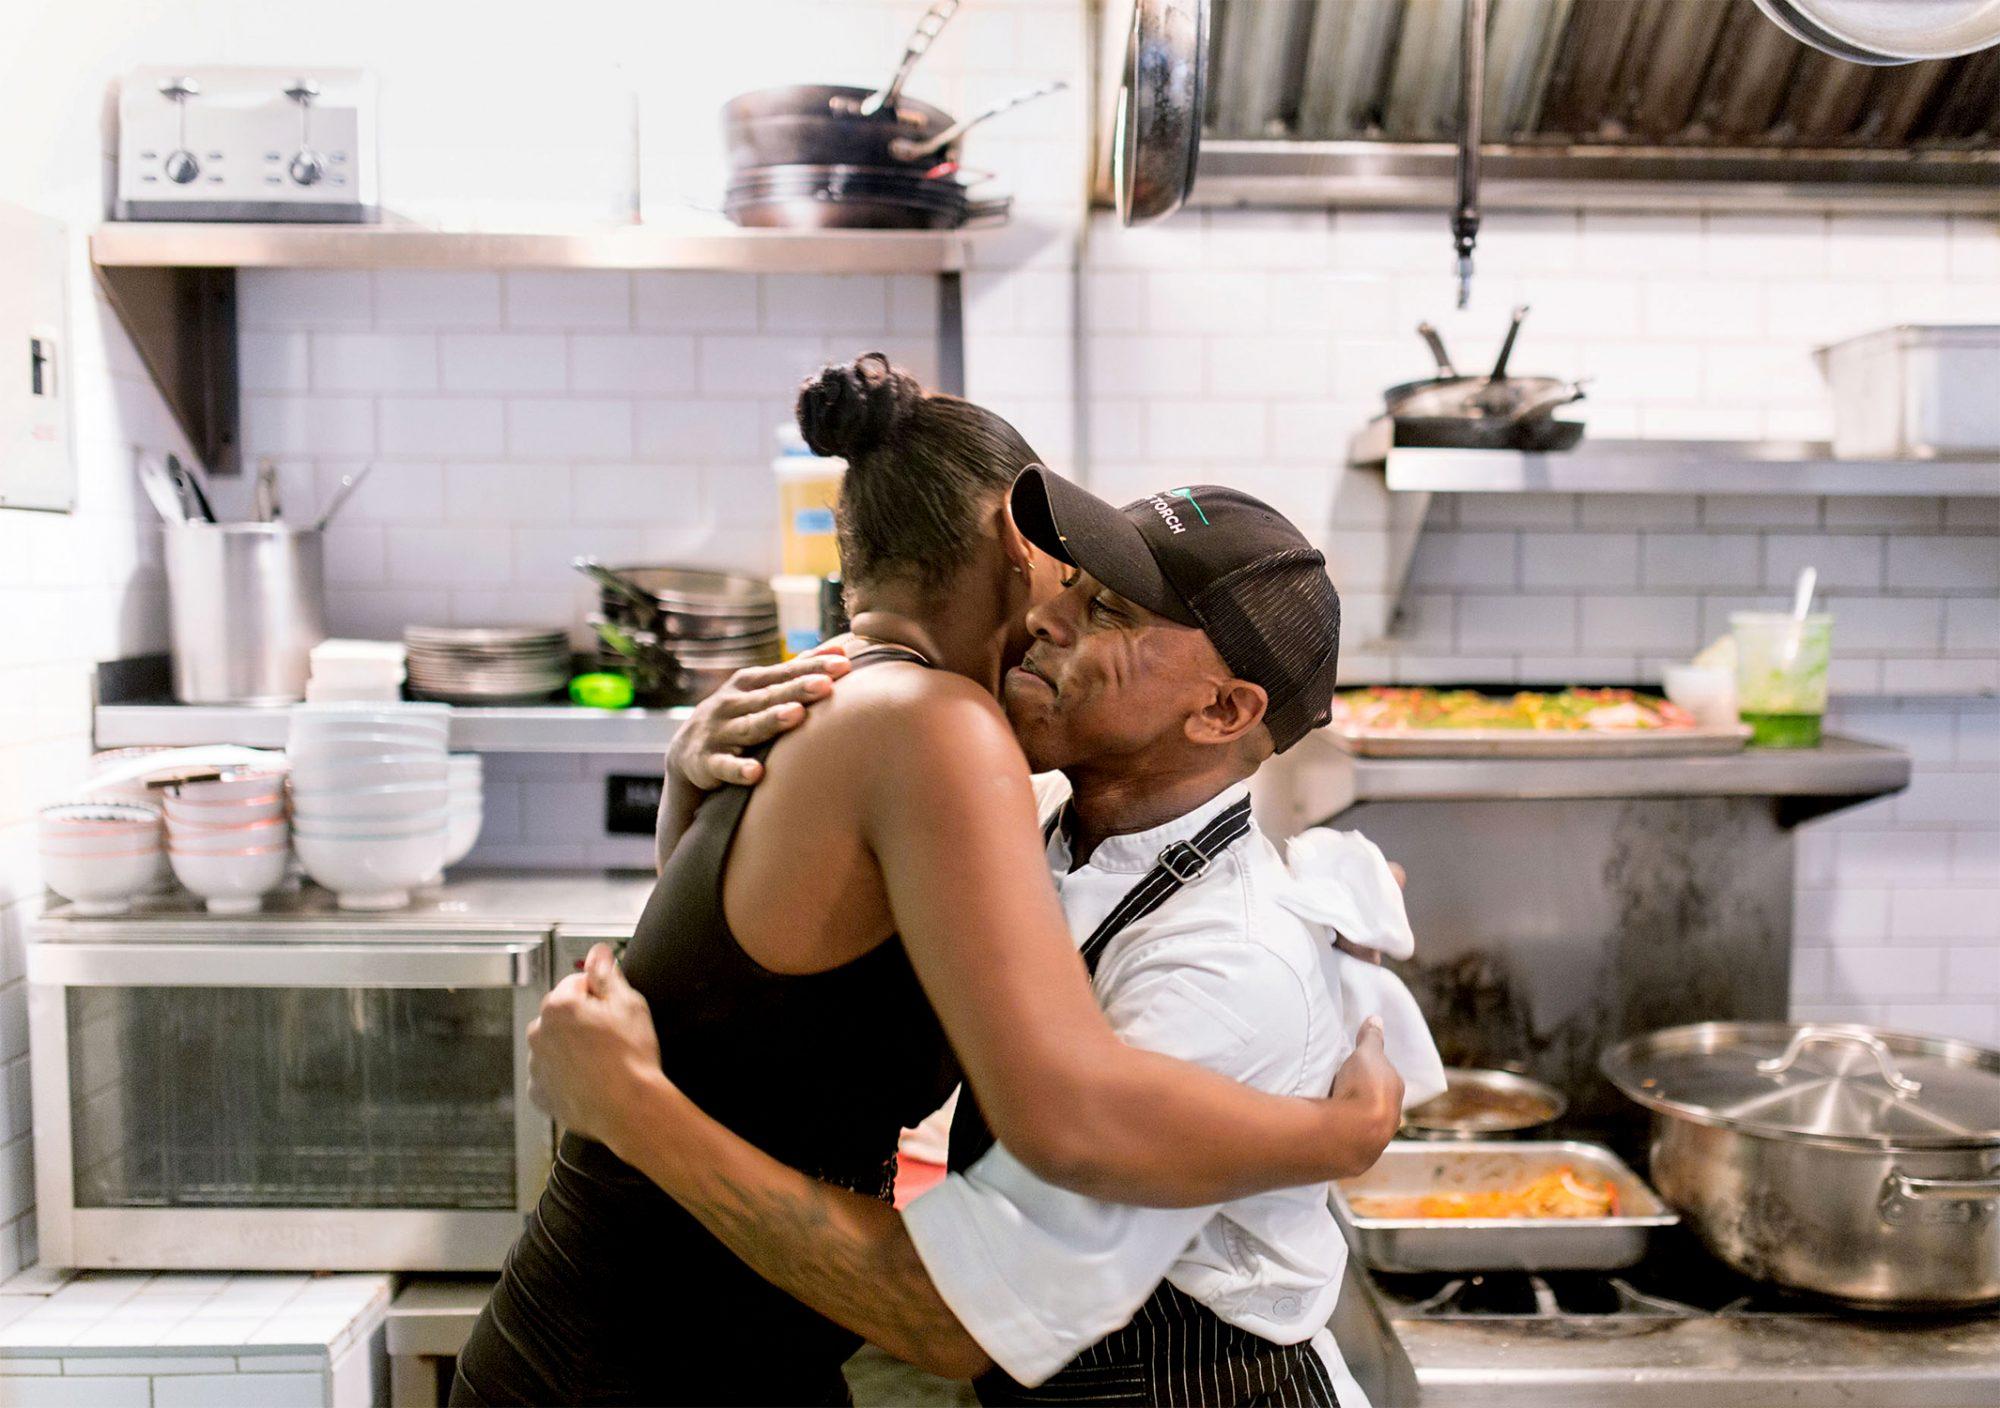 emmas torch graduate and director hugging